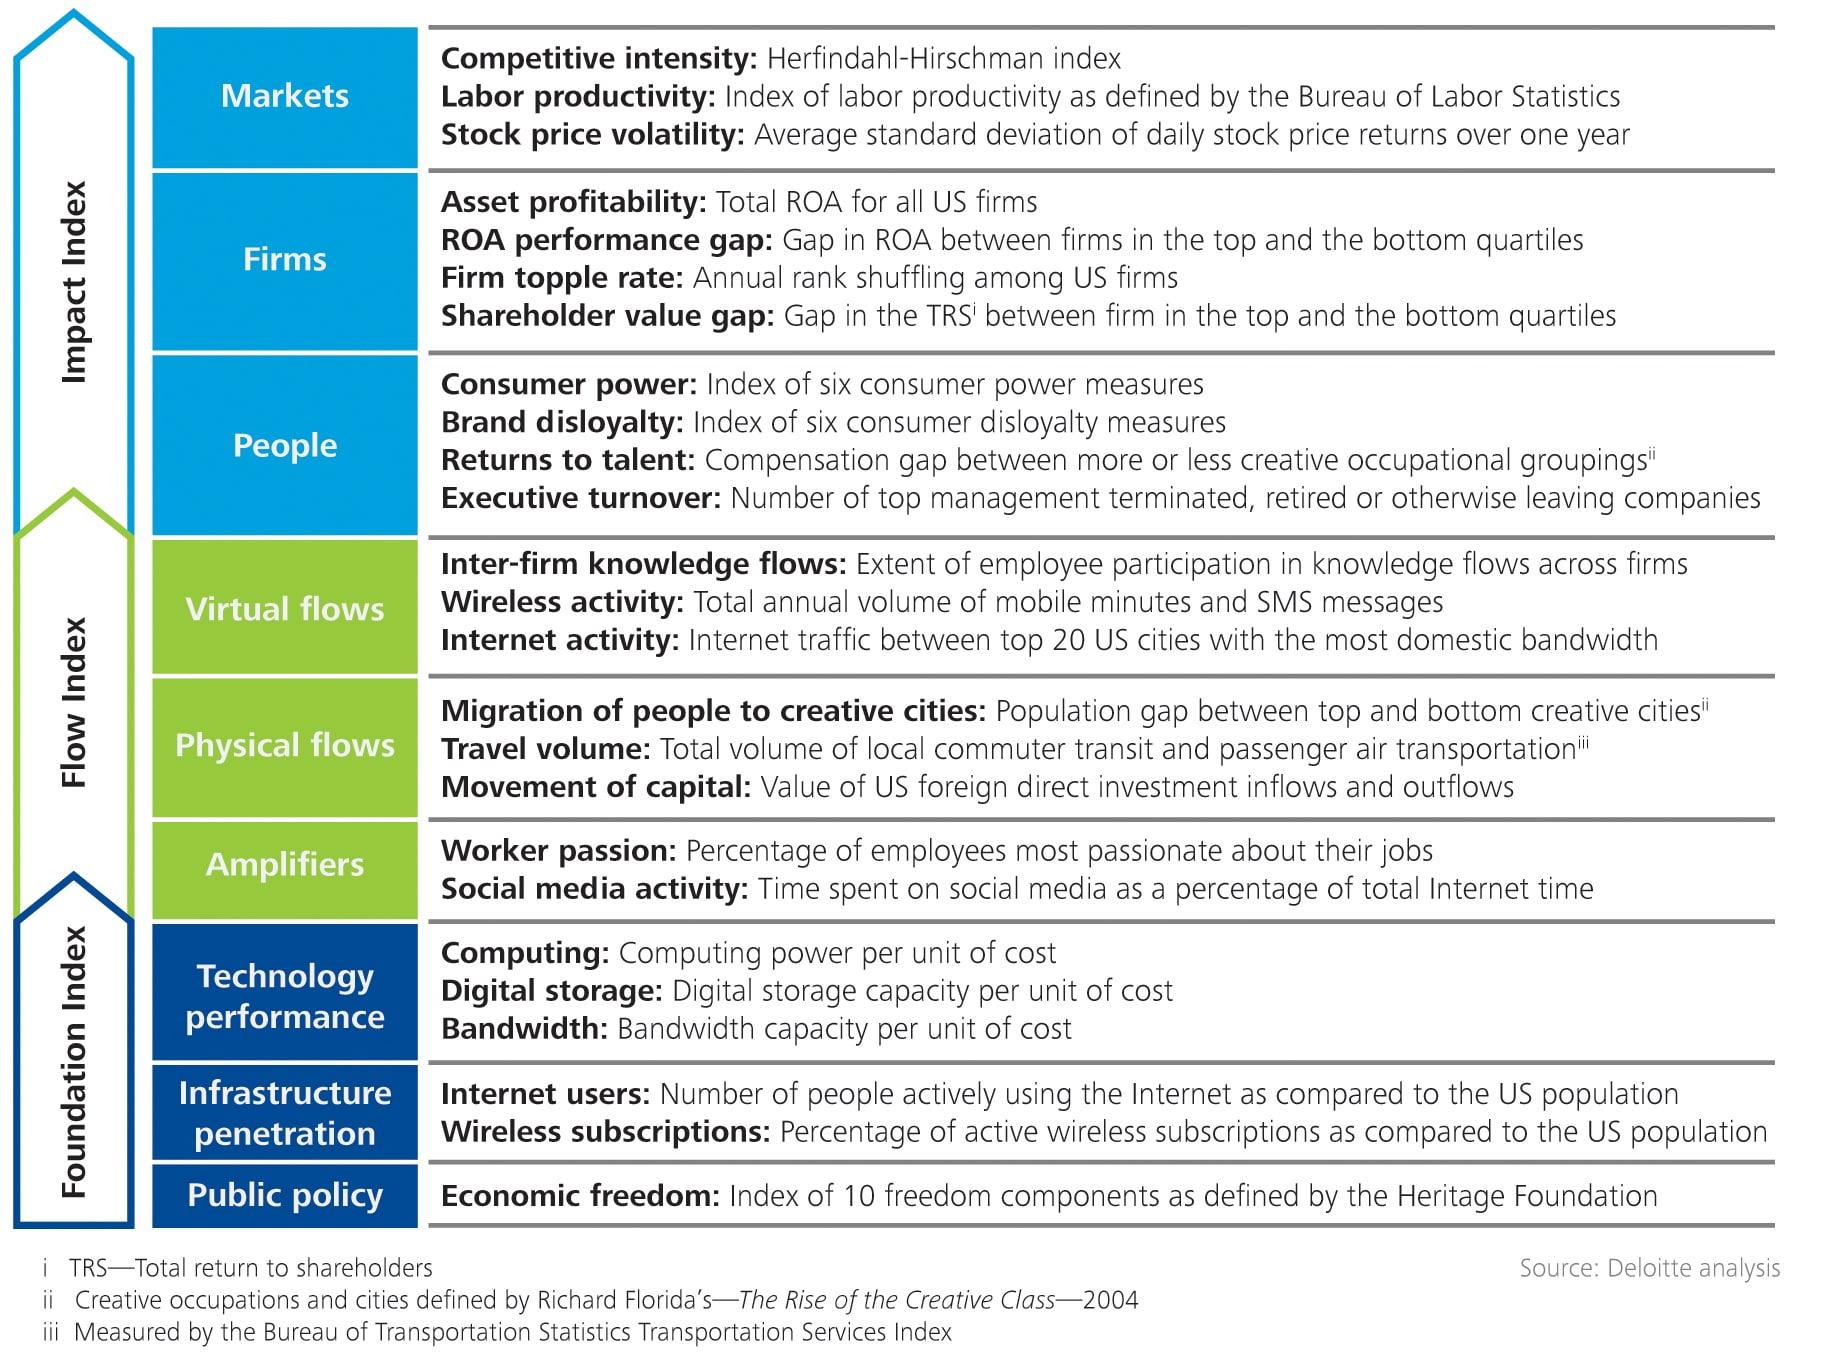 2013 Shift Index metrics: The burdens of the past | Deloitte